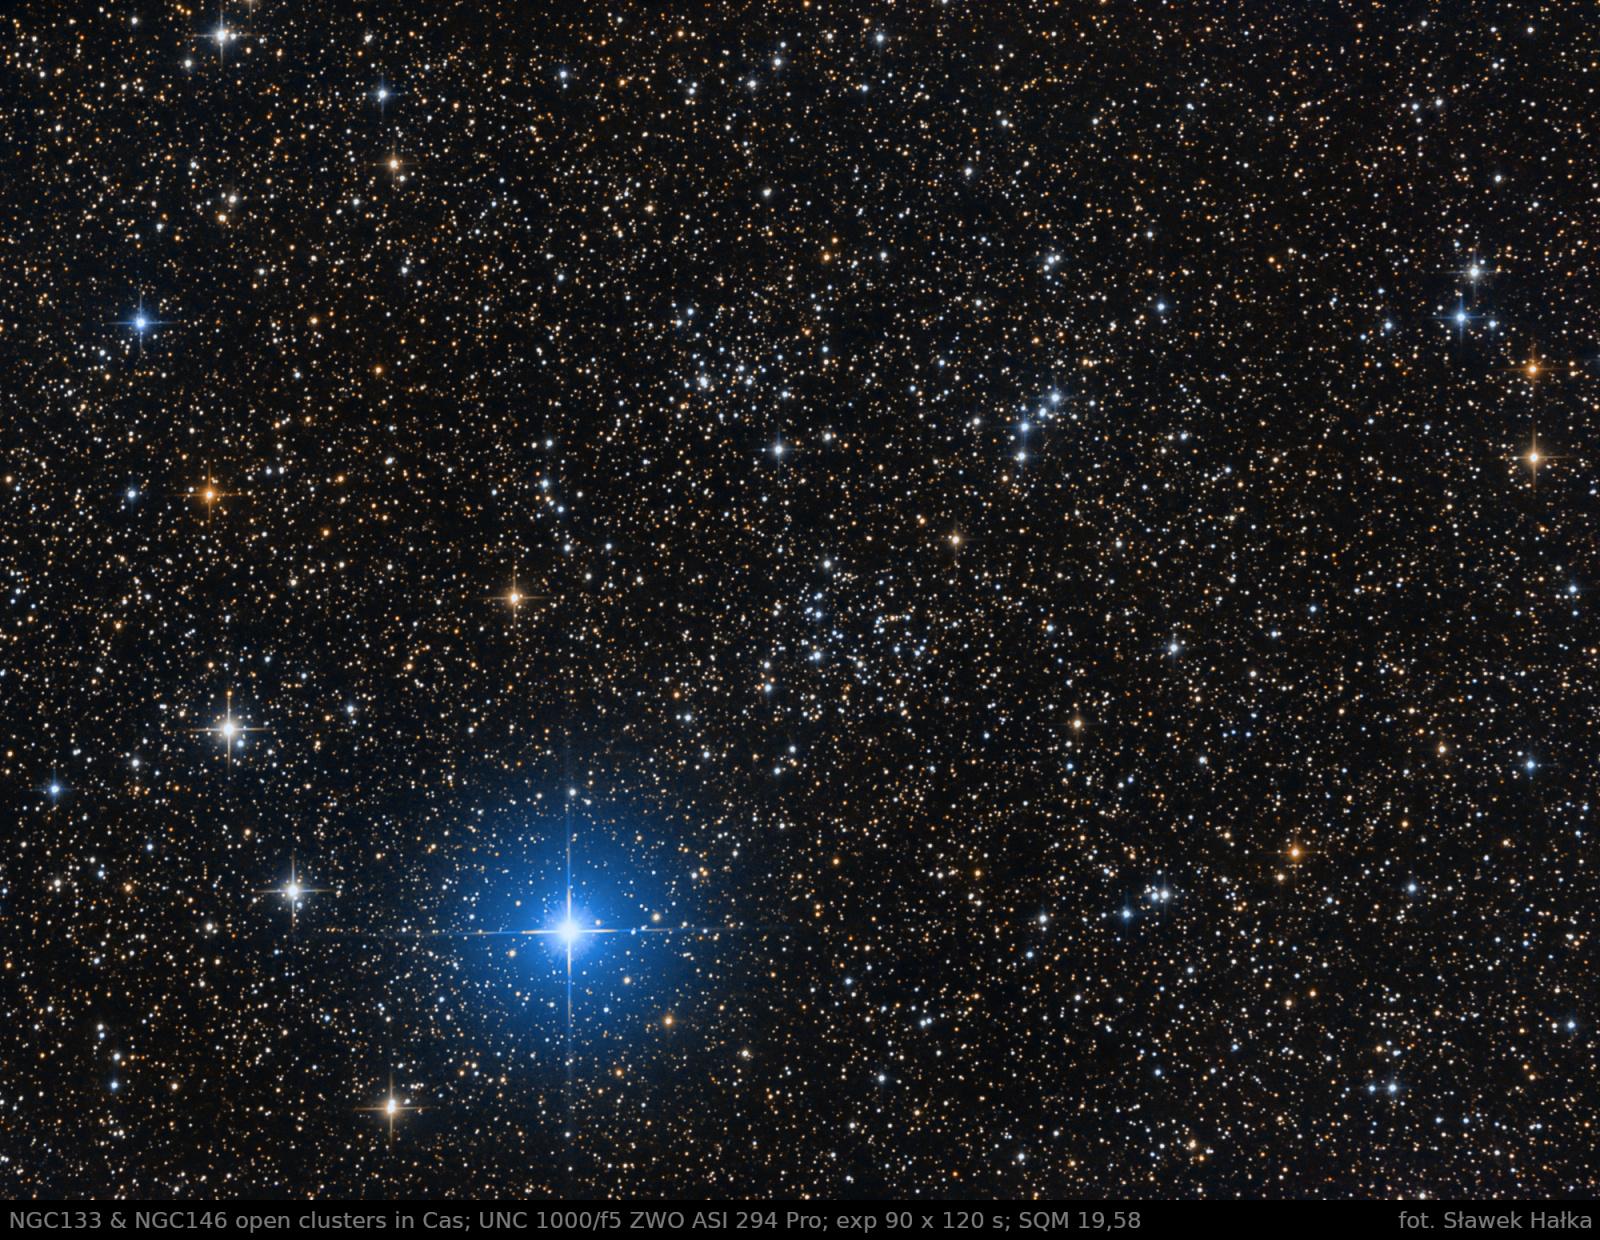 NGC133_NGC146_crop_3720_2790_resize_2000_1500.thumb.jpg.56efaad90255bc879c4582c9e56685f1.jpg